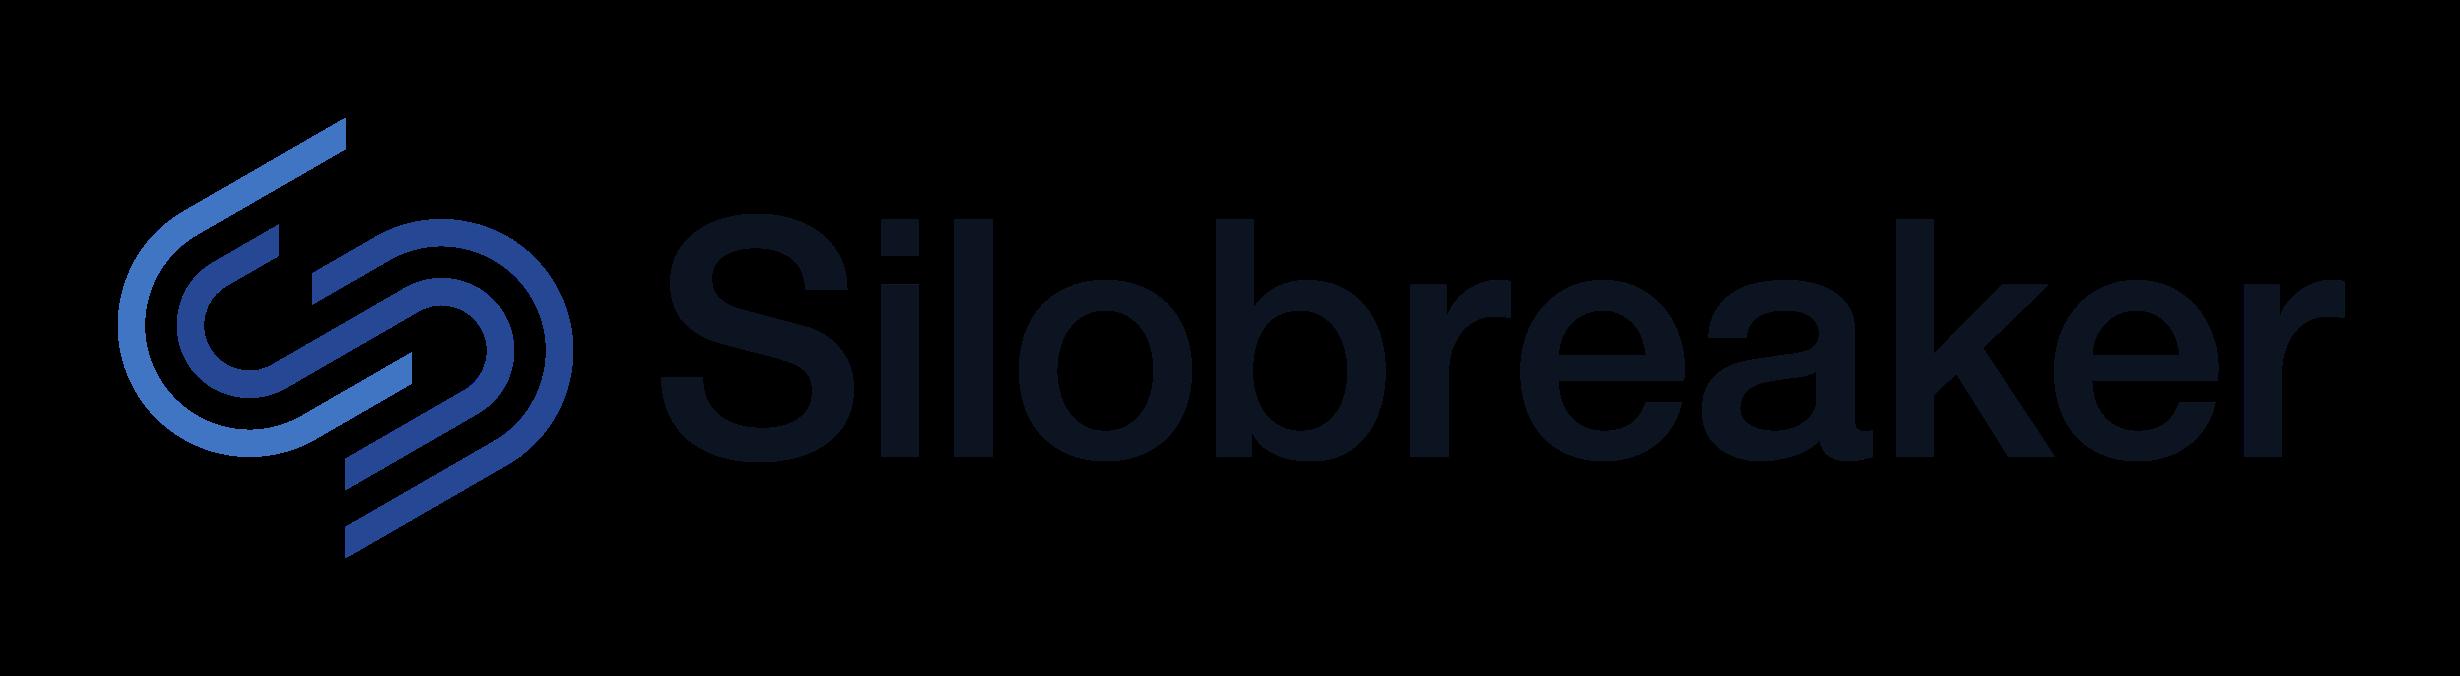 Silobreaker-Logo